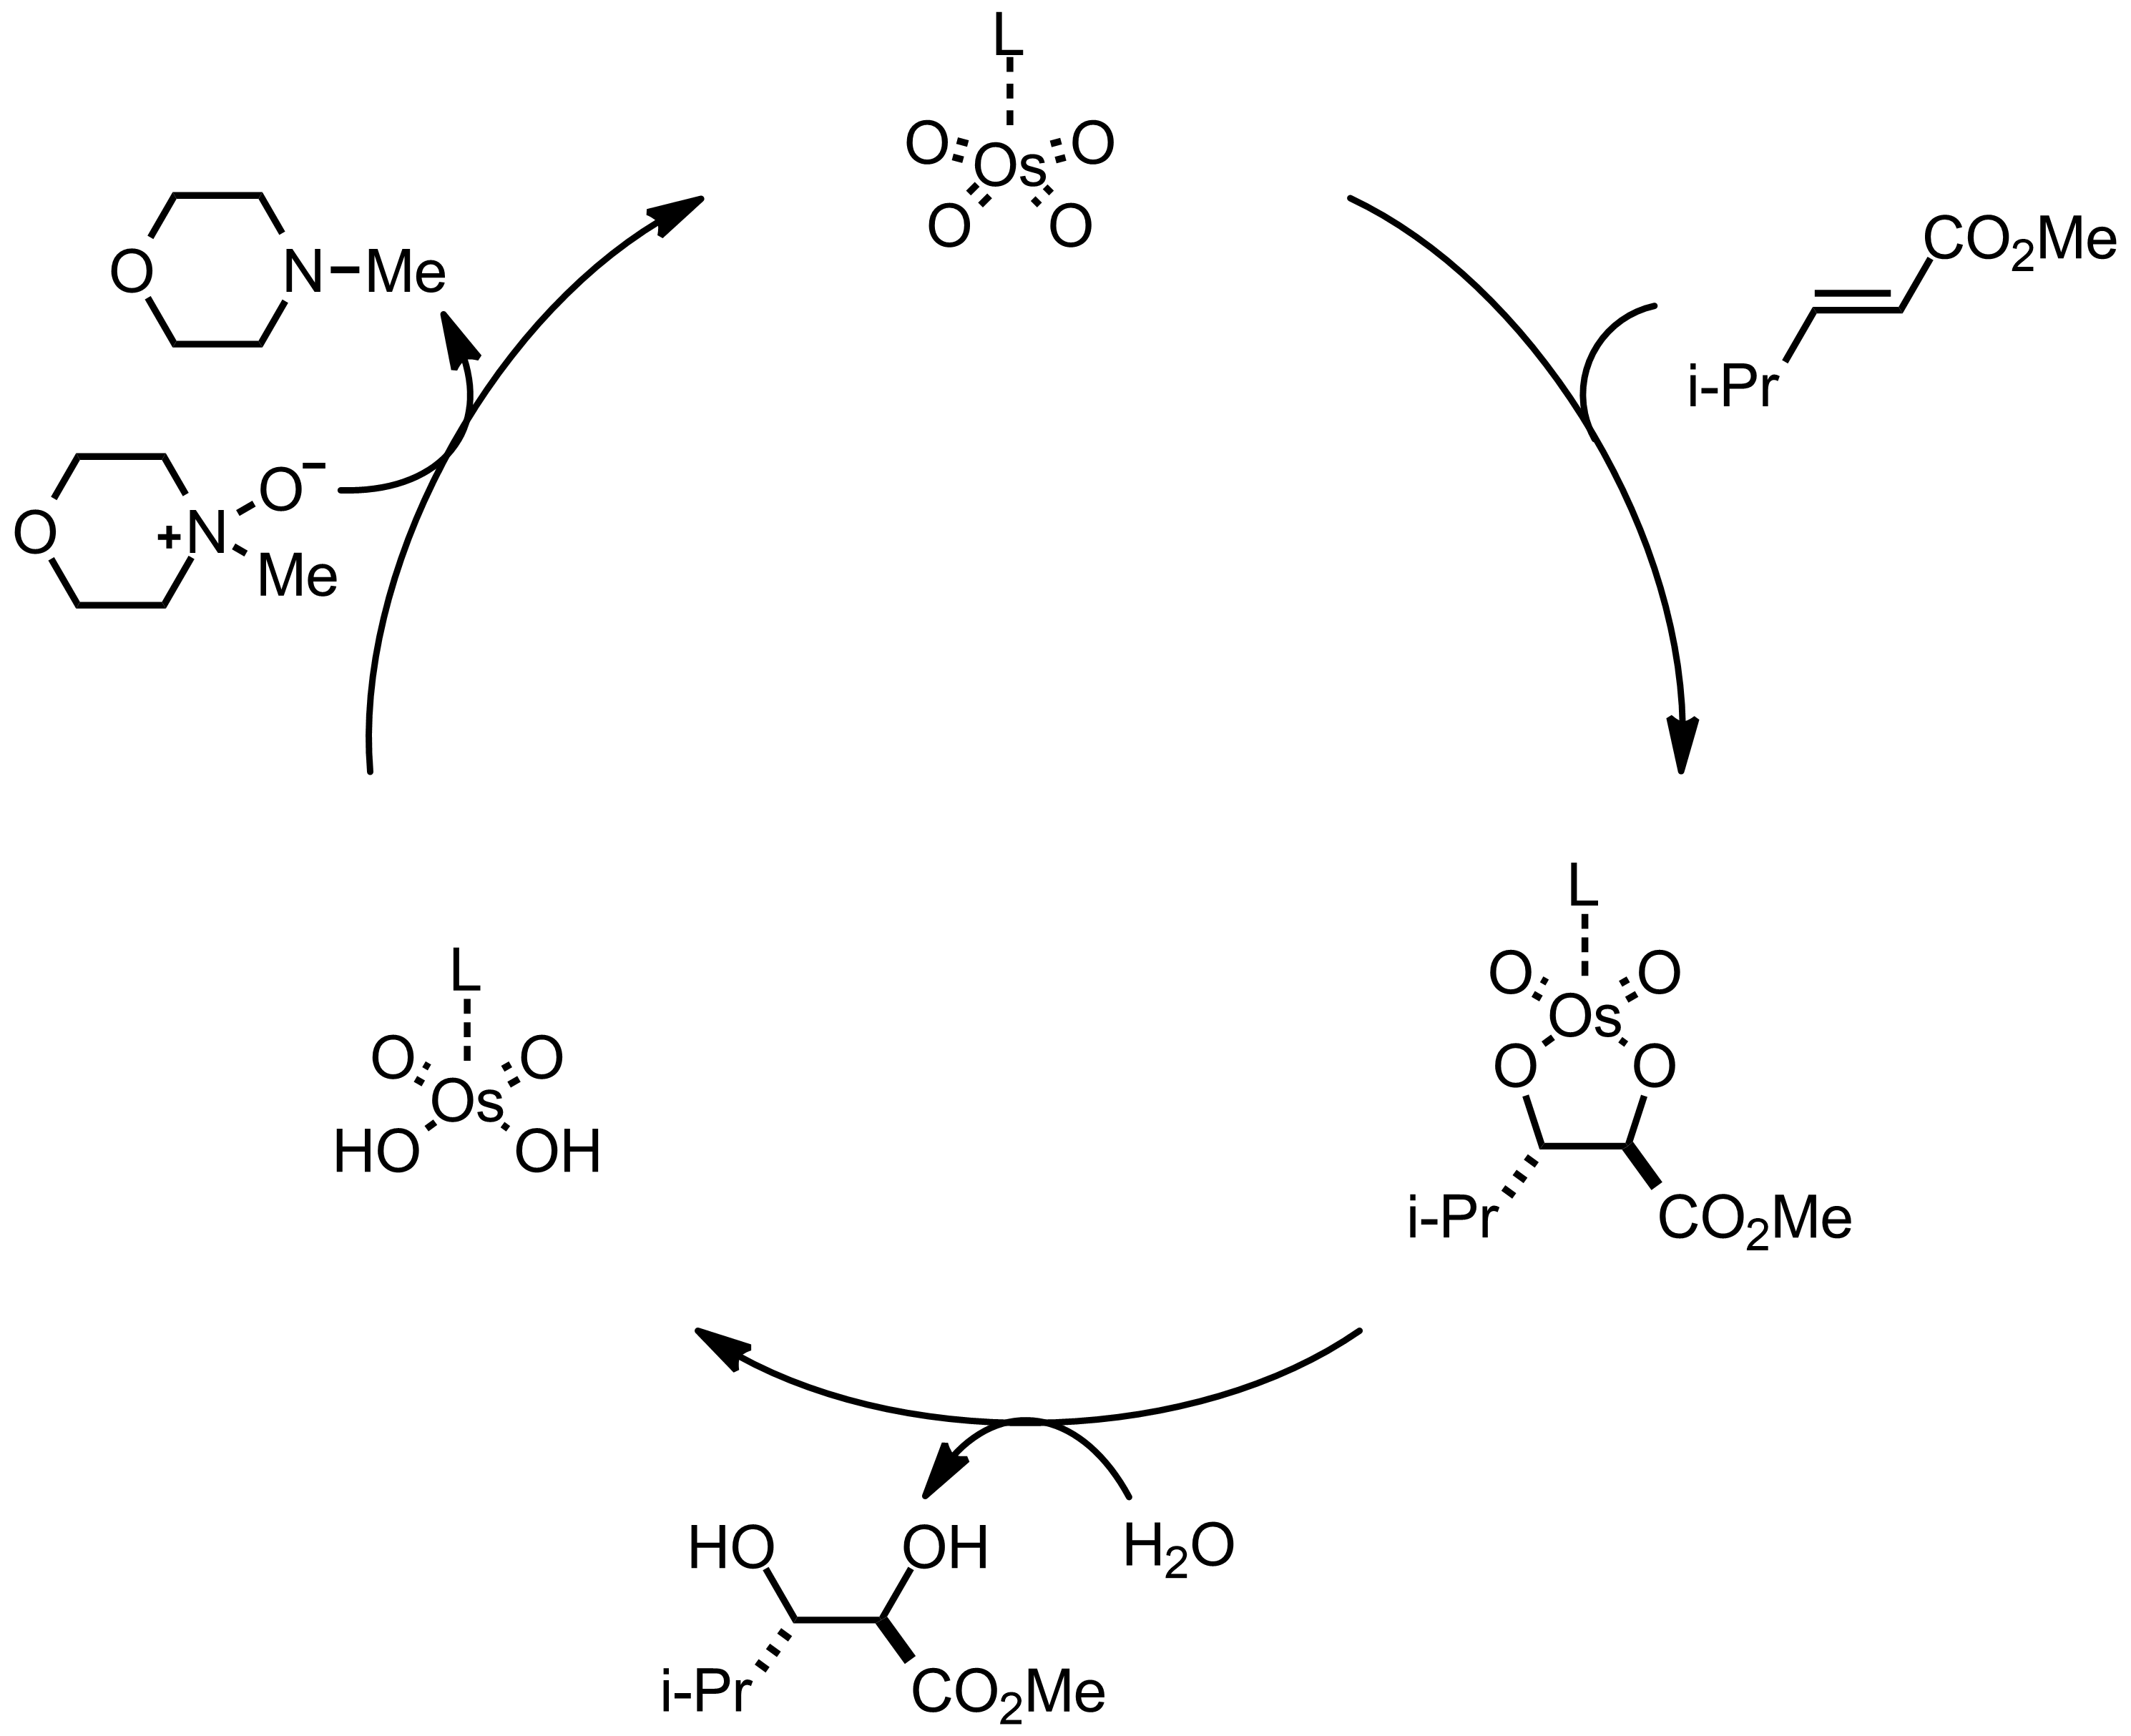 Mechanism of the Sharpless Asymmetric Dihydroxylation